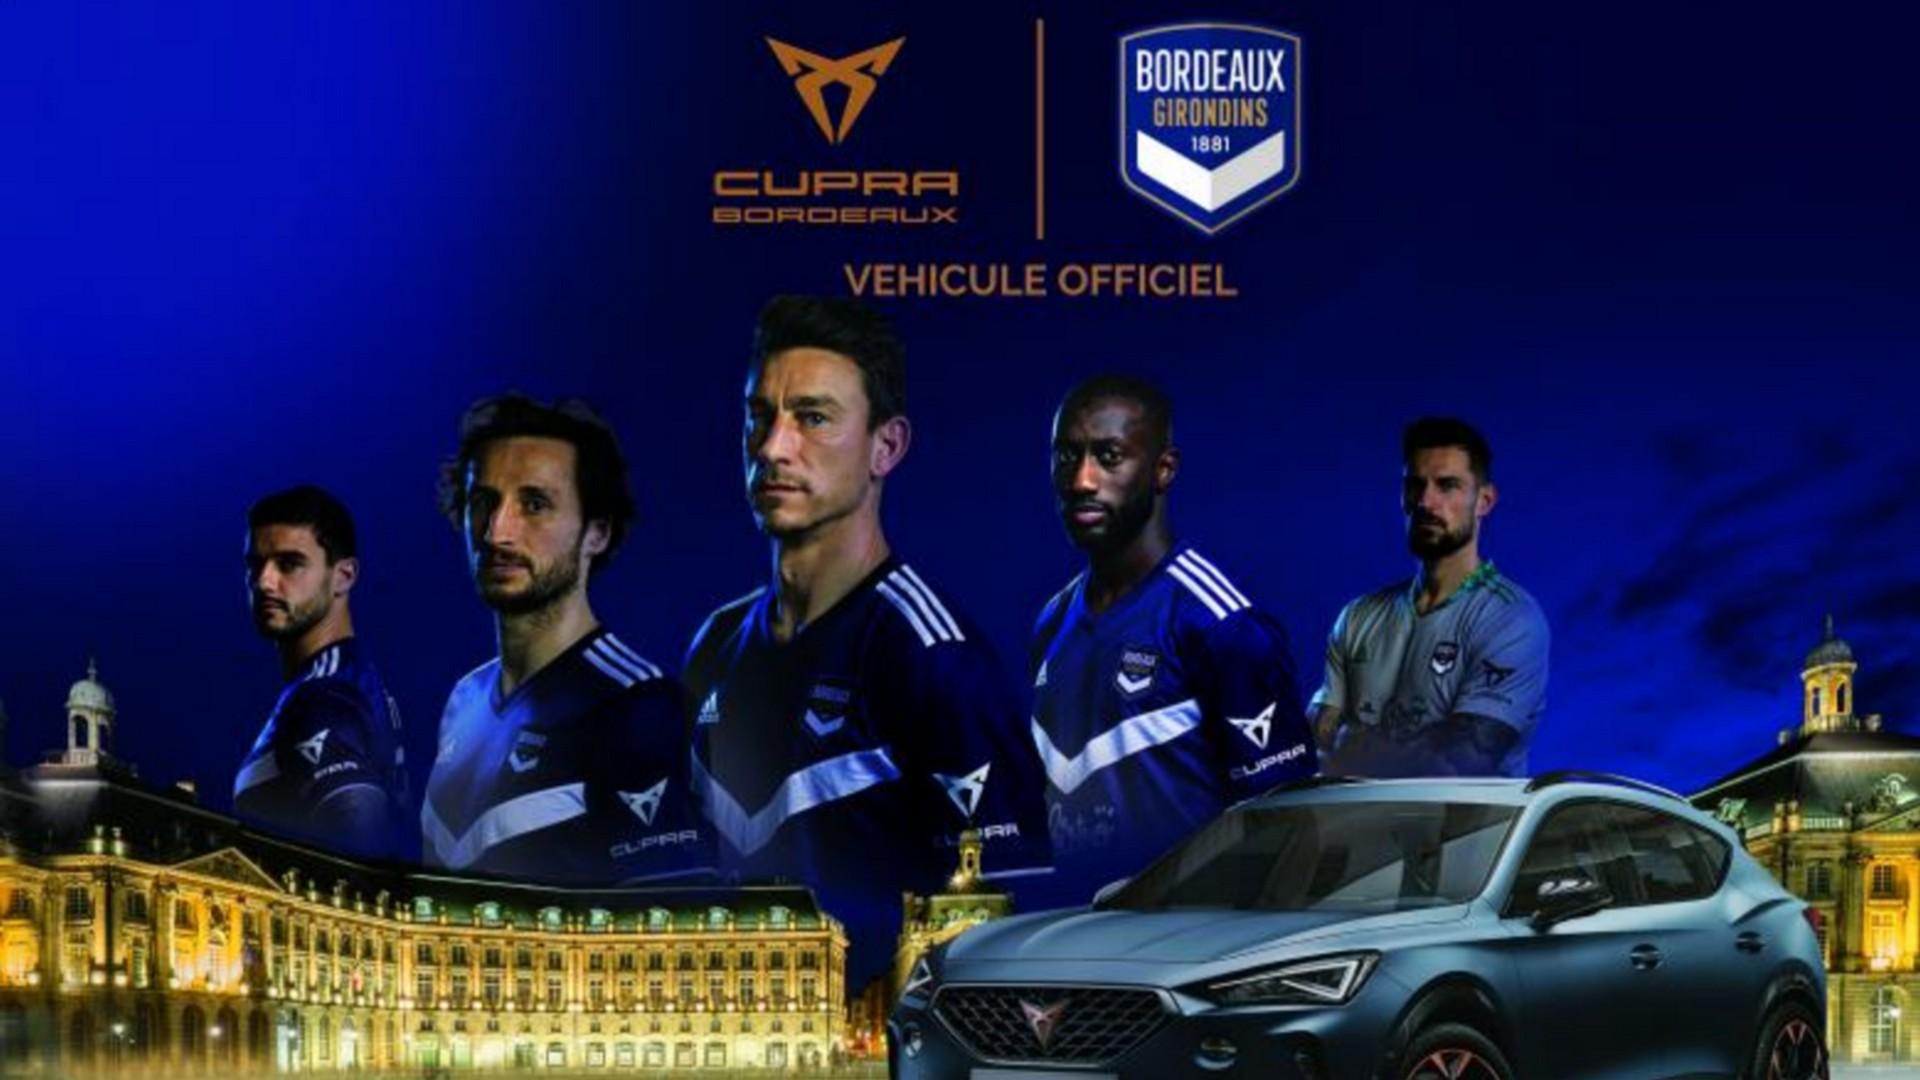 Cupra x Girondins (football) 2021